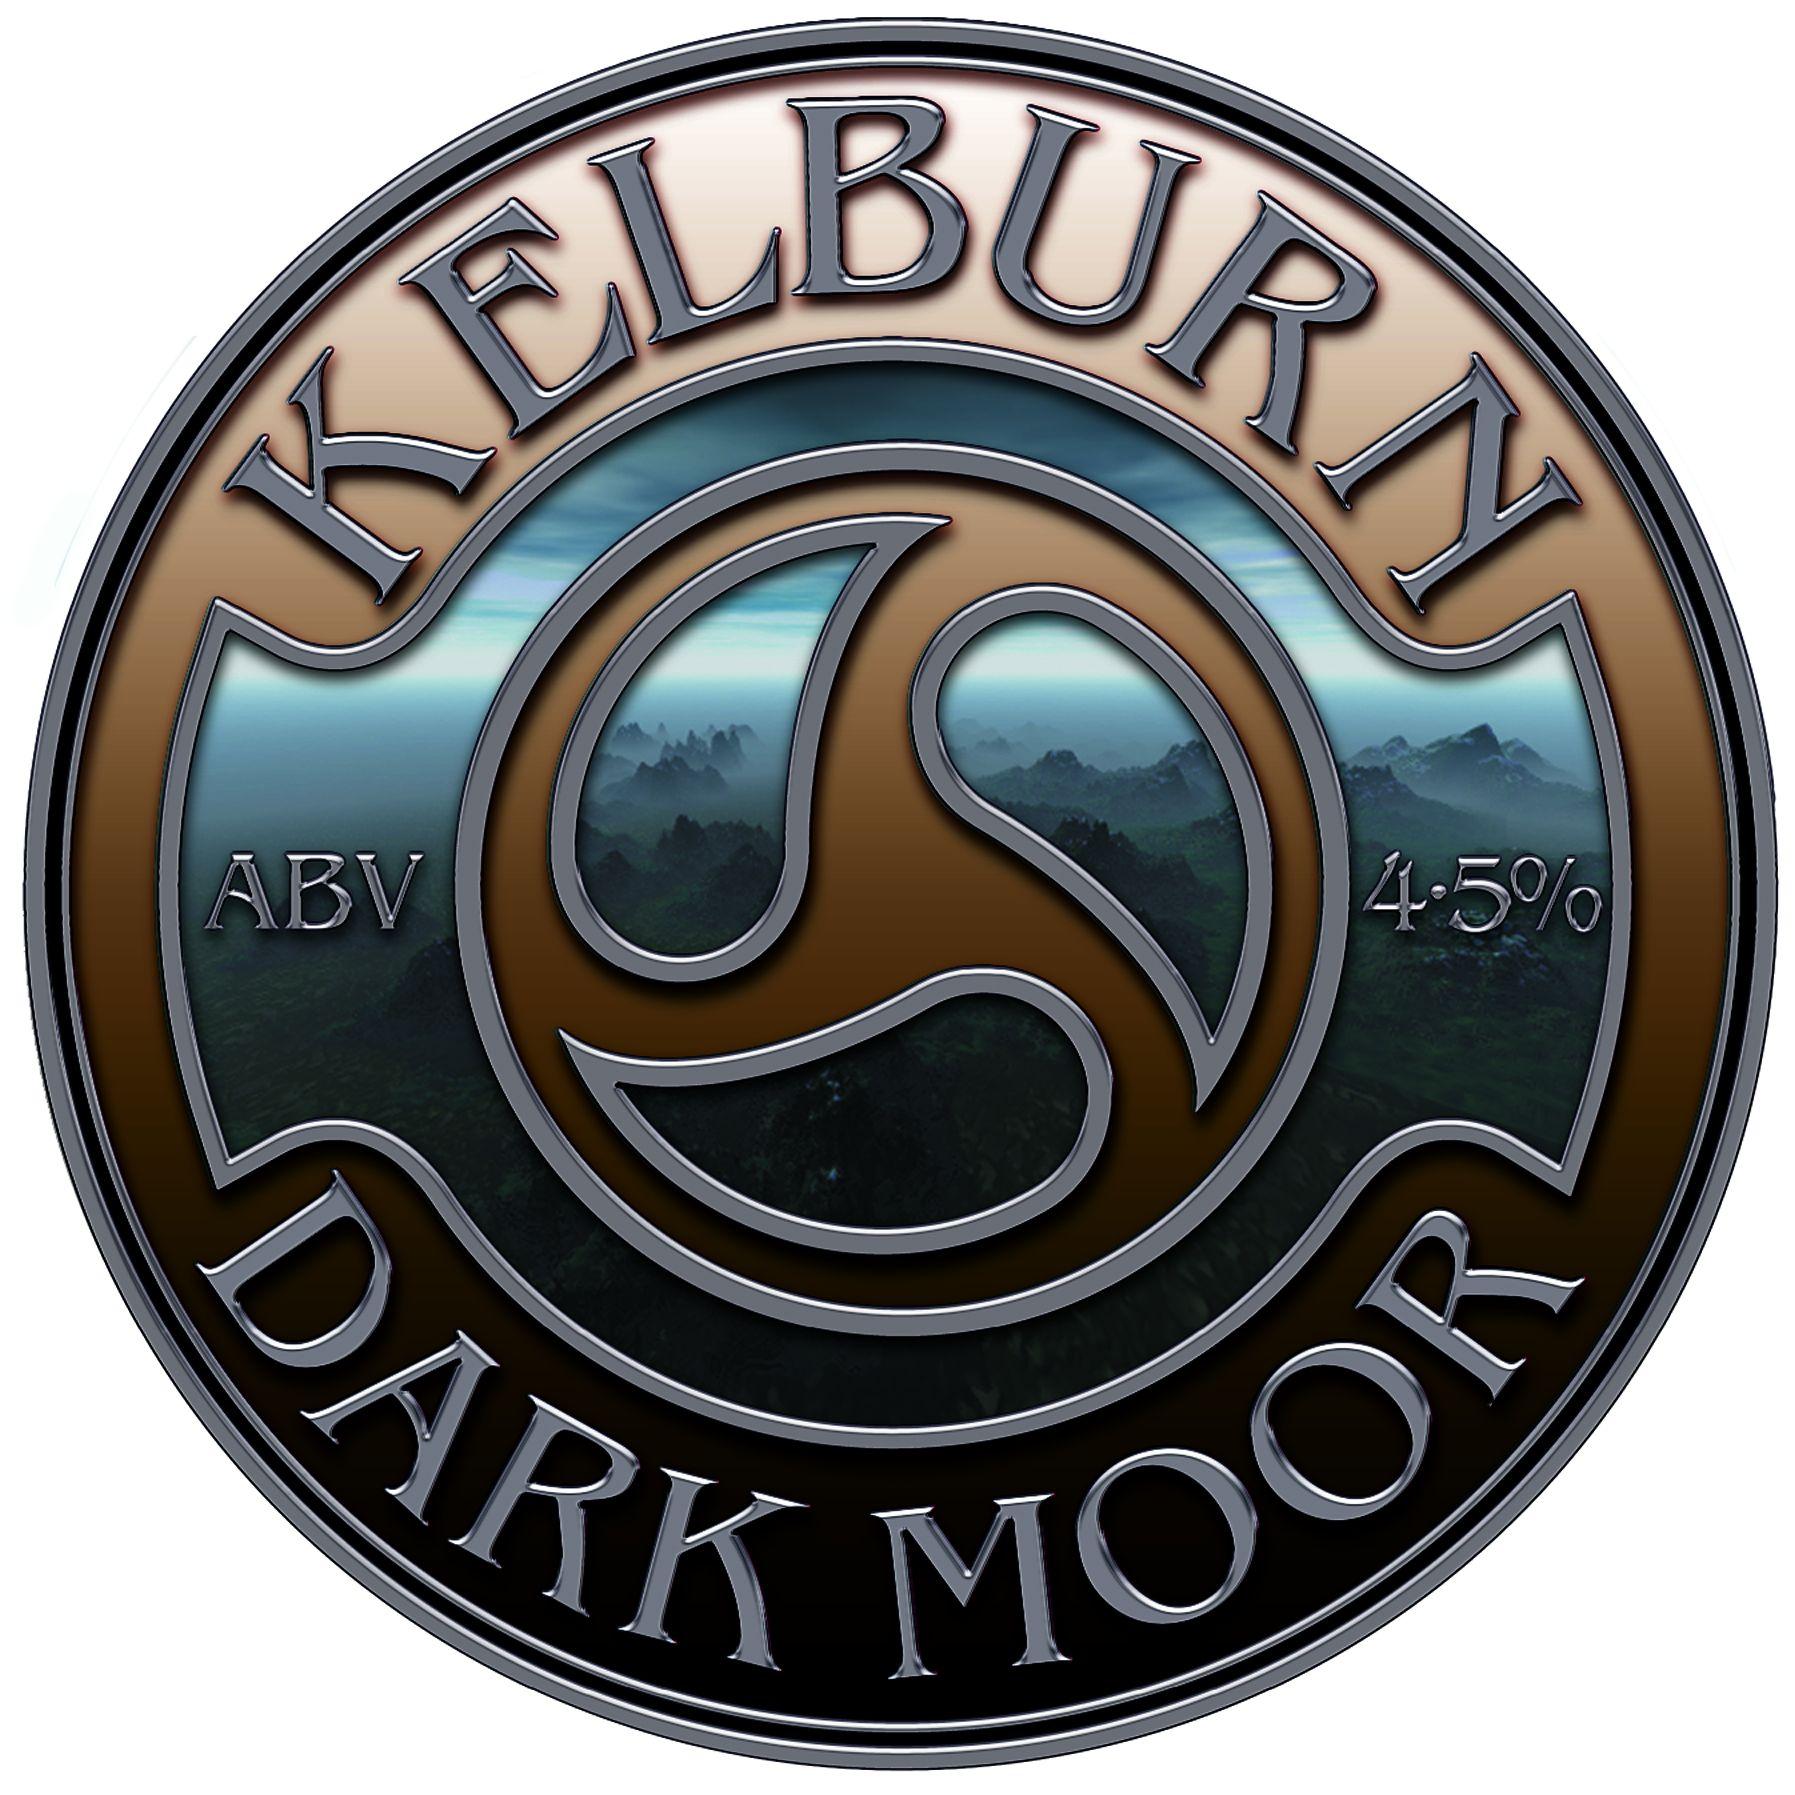 Kelburn Dark Moor 9 Gallons Dark 4.5%